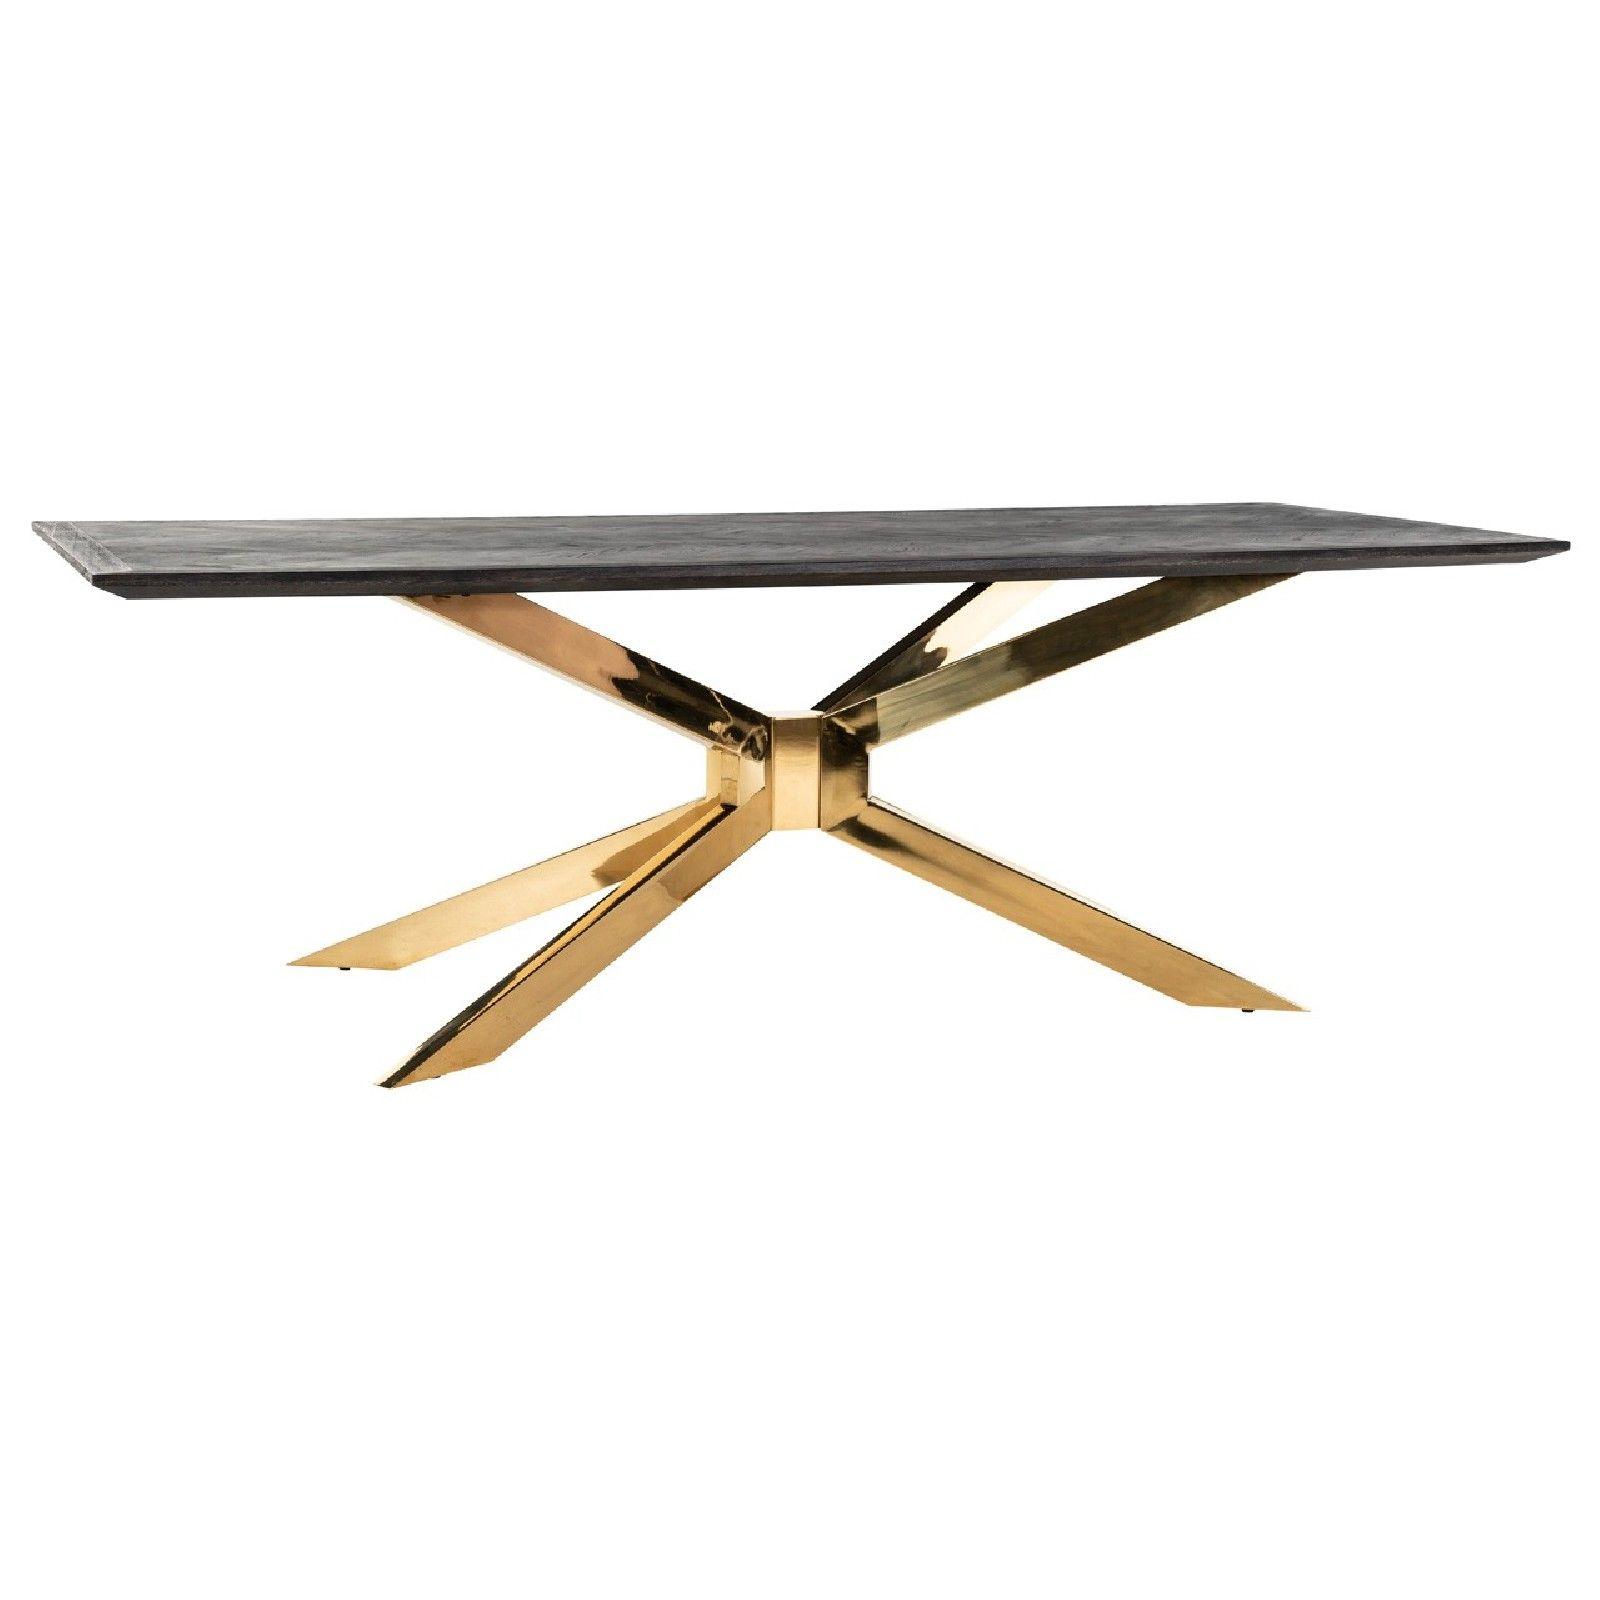 Table à dîner Blackbone Matrix gold 240x100 Meuble Déco Tendance - 1